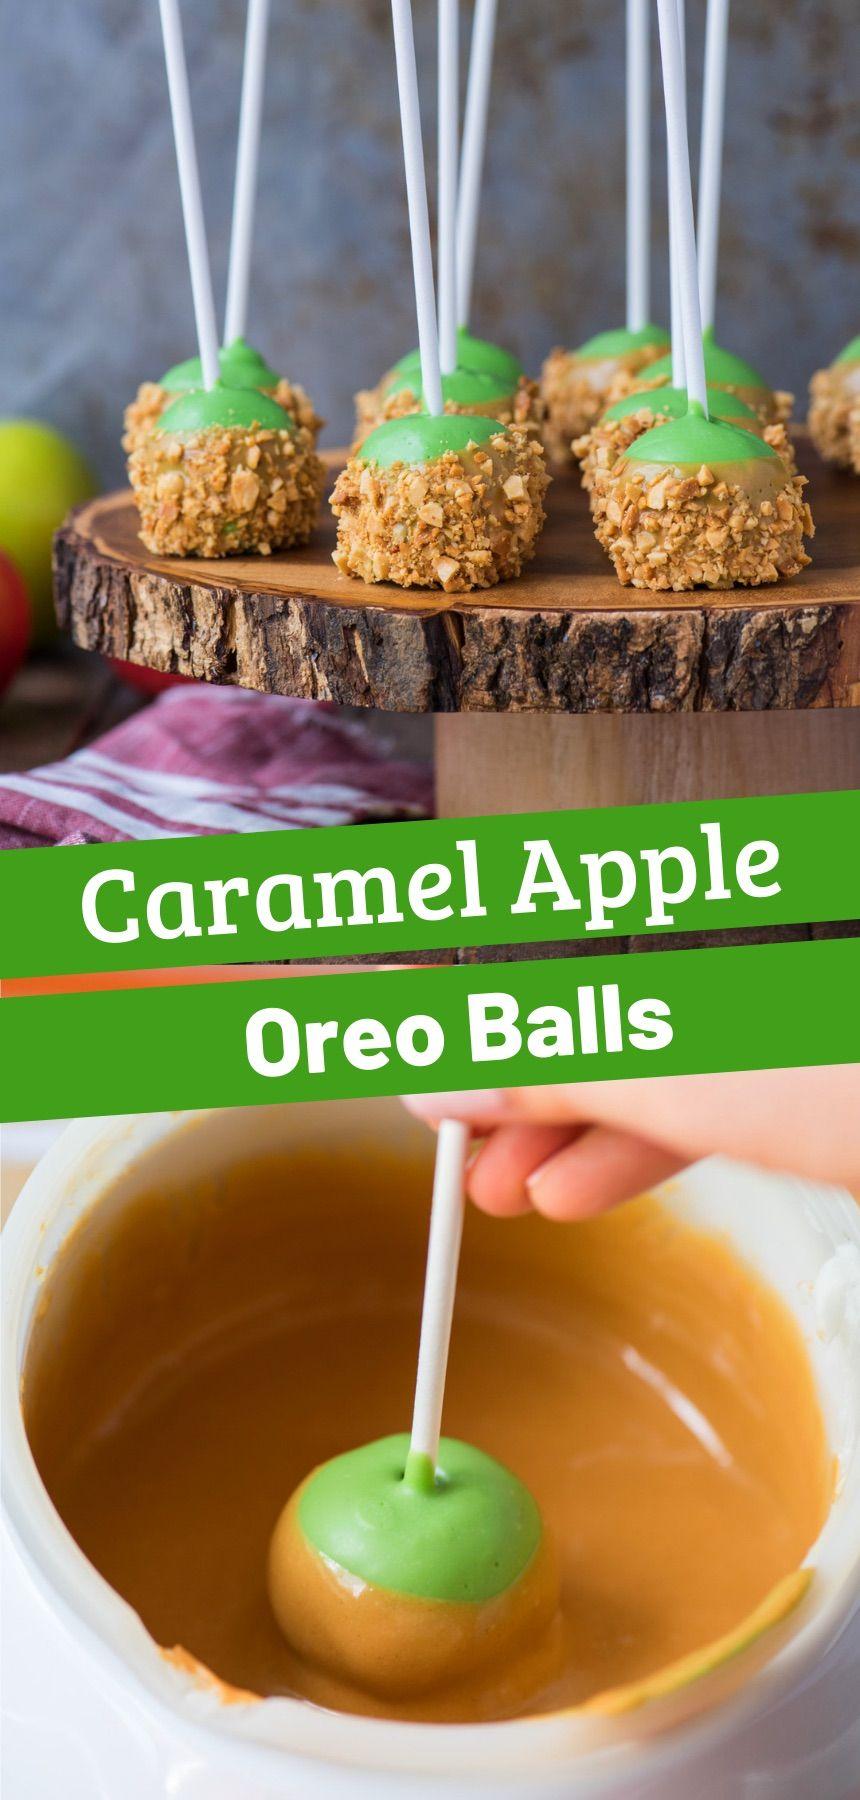 Caramel Apple Oreo Balls